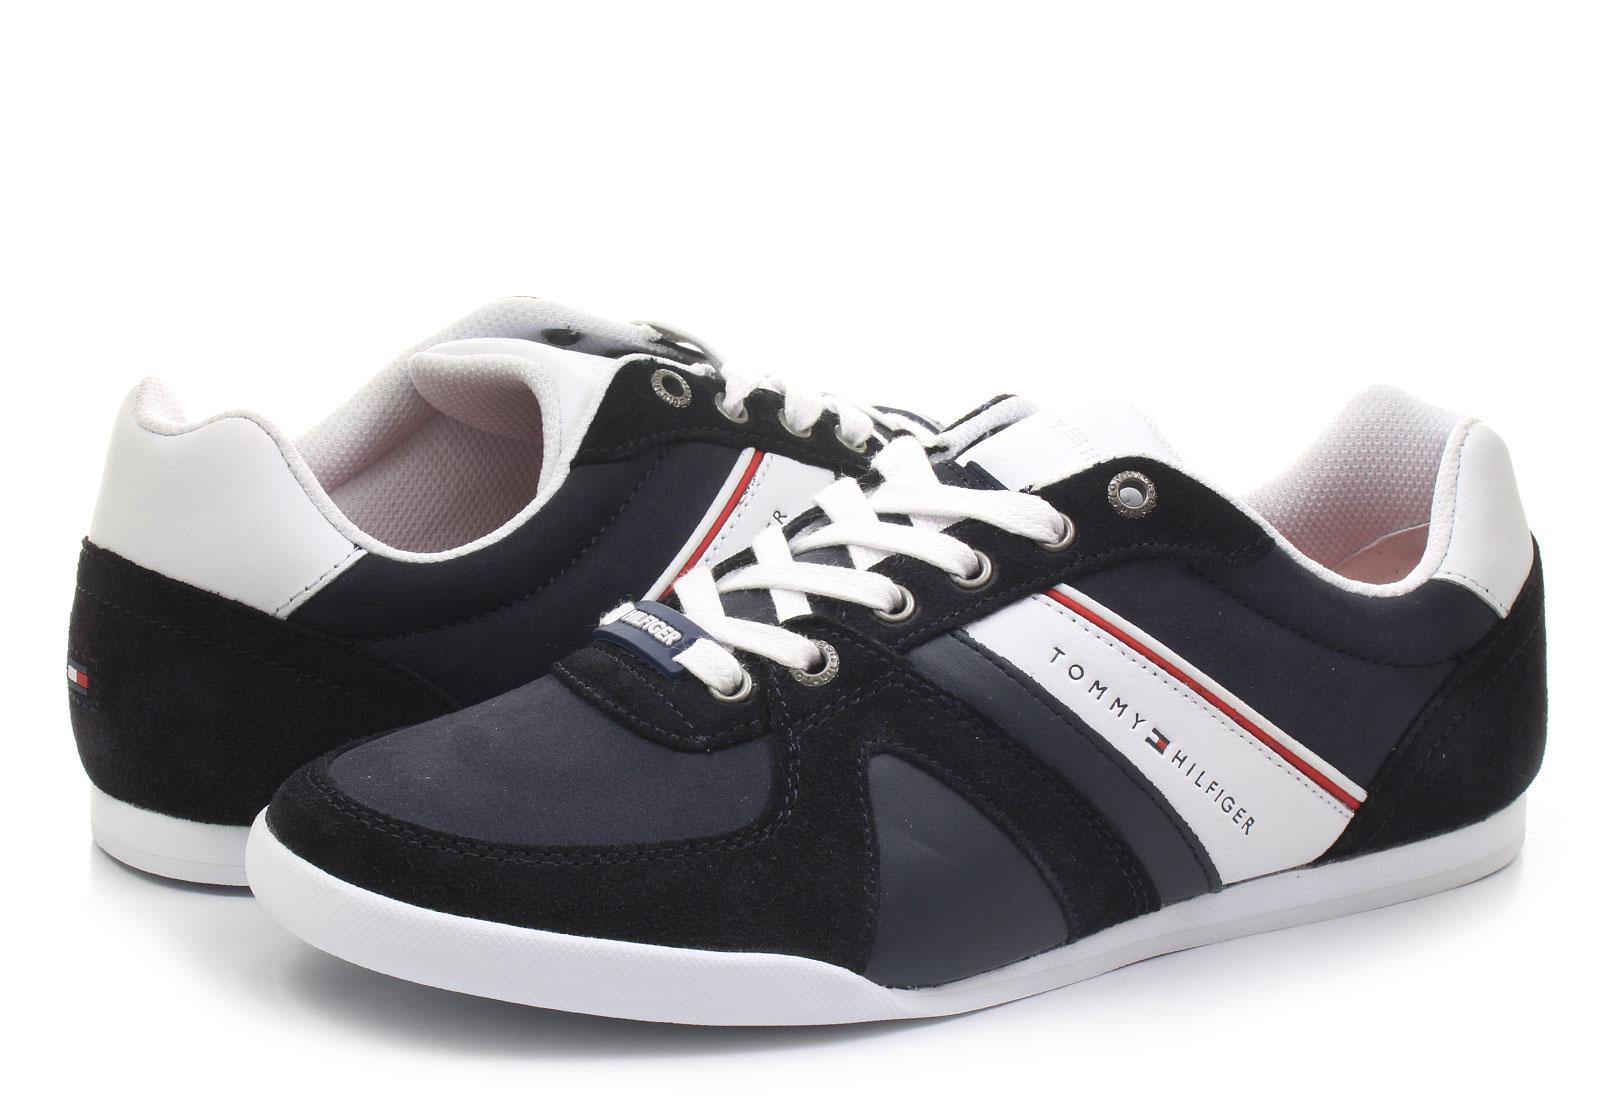 804604660a Tommy Hilfiger Cipő - Riley 2c - 16S-1103-403 - Office Shoes ...